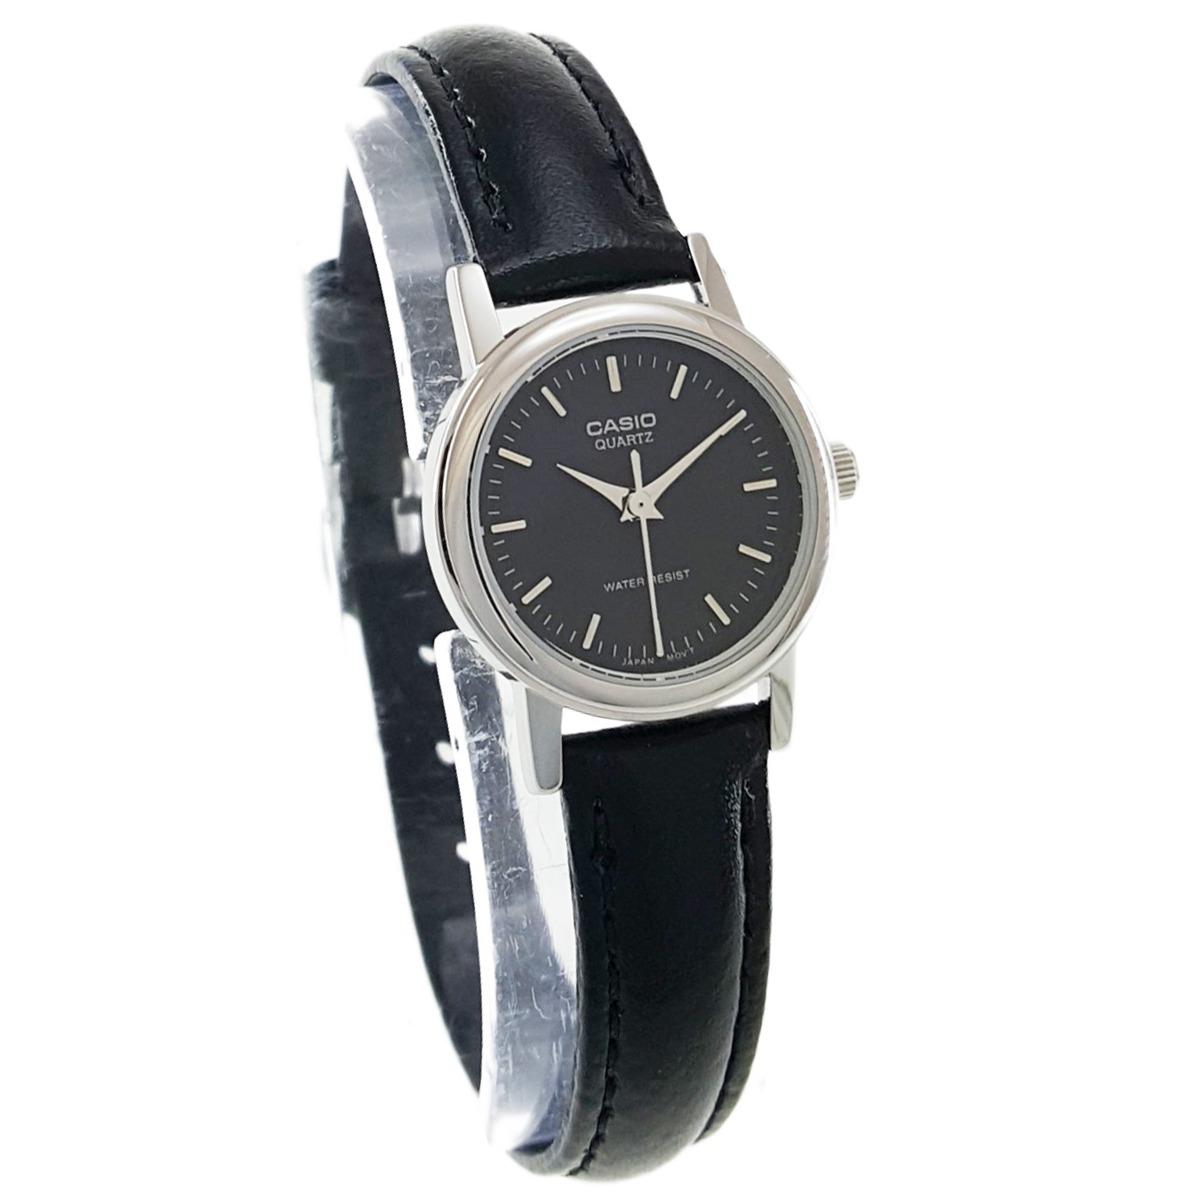 d380dfd62337 casio general ladies relojes correa moda ltp-1095e-1adf - ww. Cargando zoom.